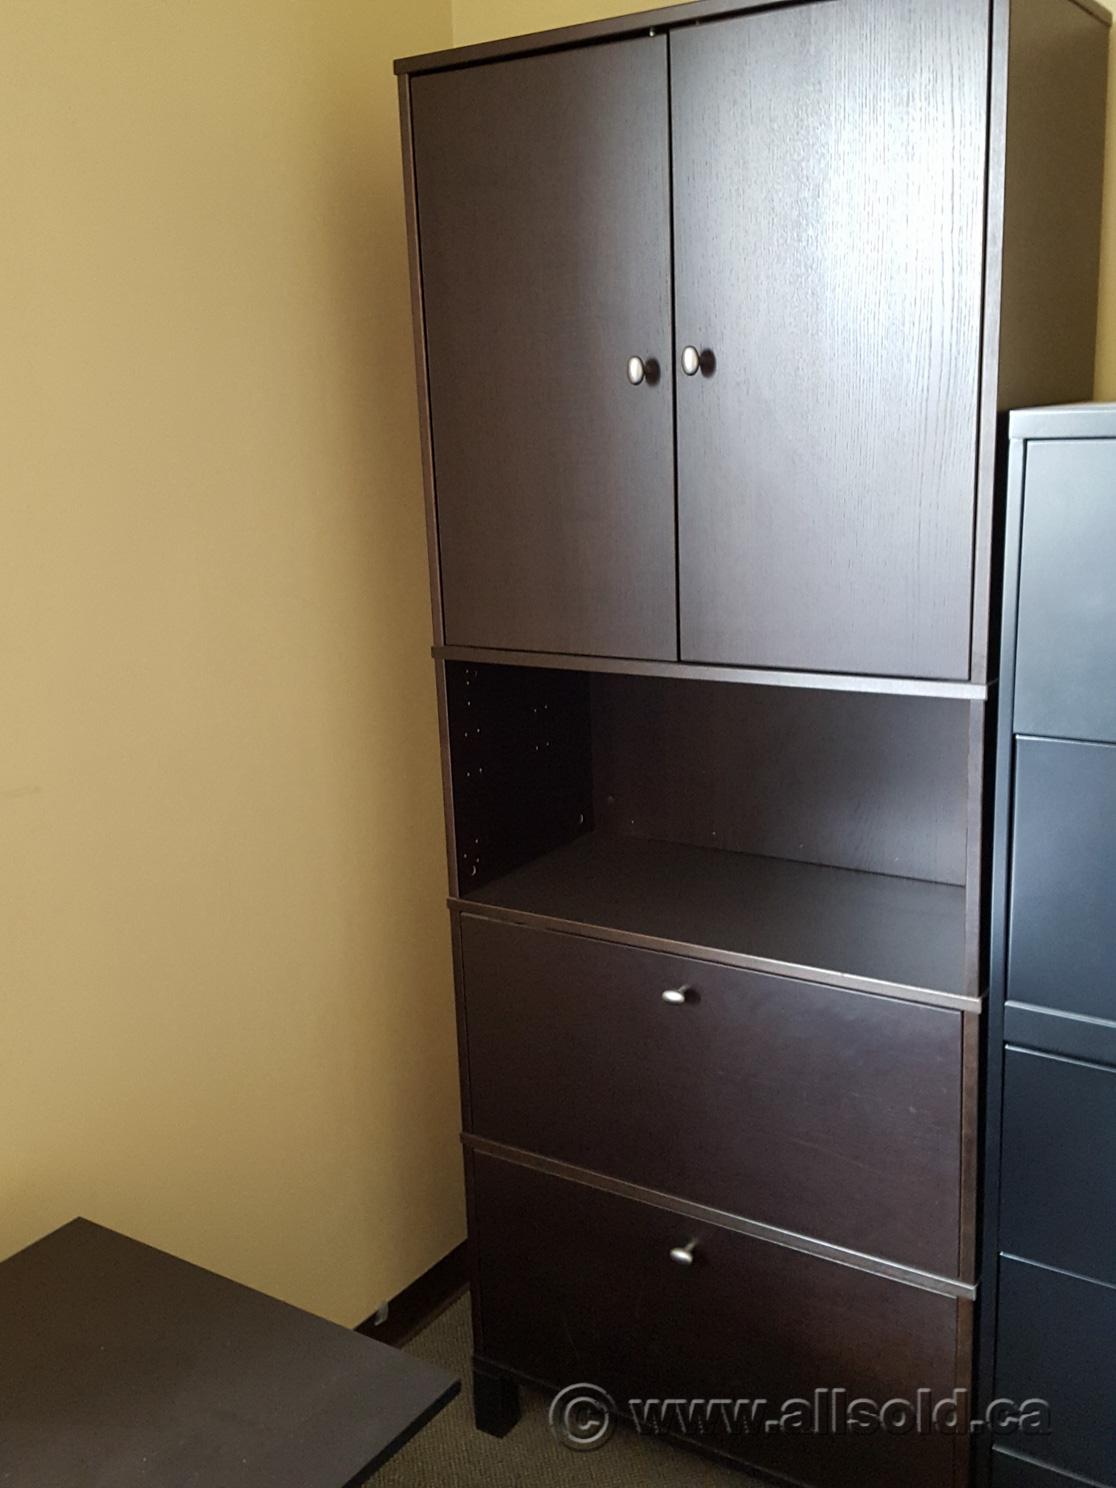 ikea effektiv espresso 2 drawer lateral file cabinet w storage buy sell used. Black Bedroom Furniture Sets. Home Design Ideas